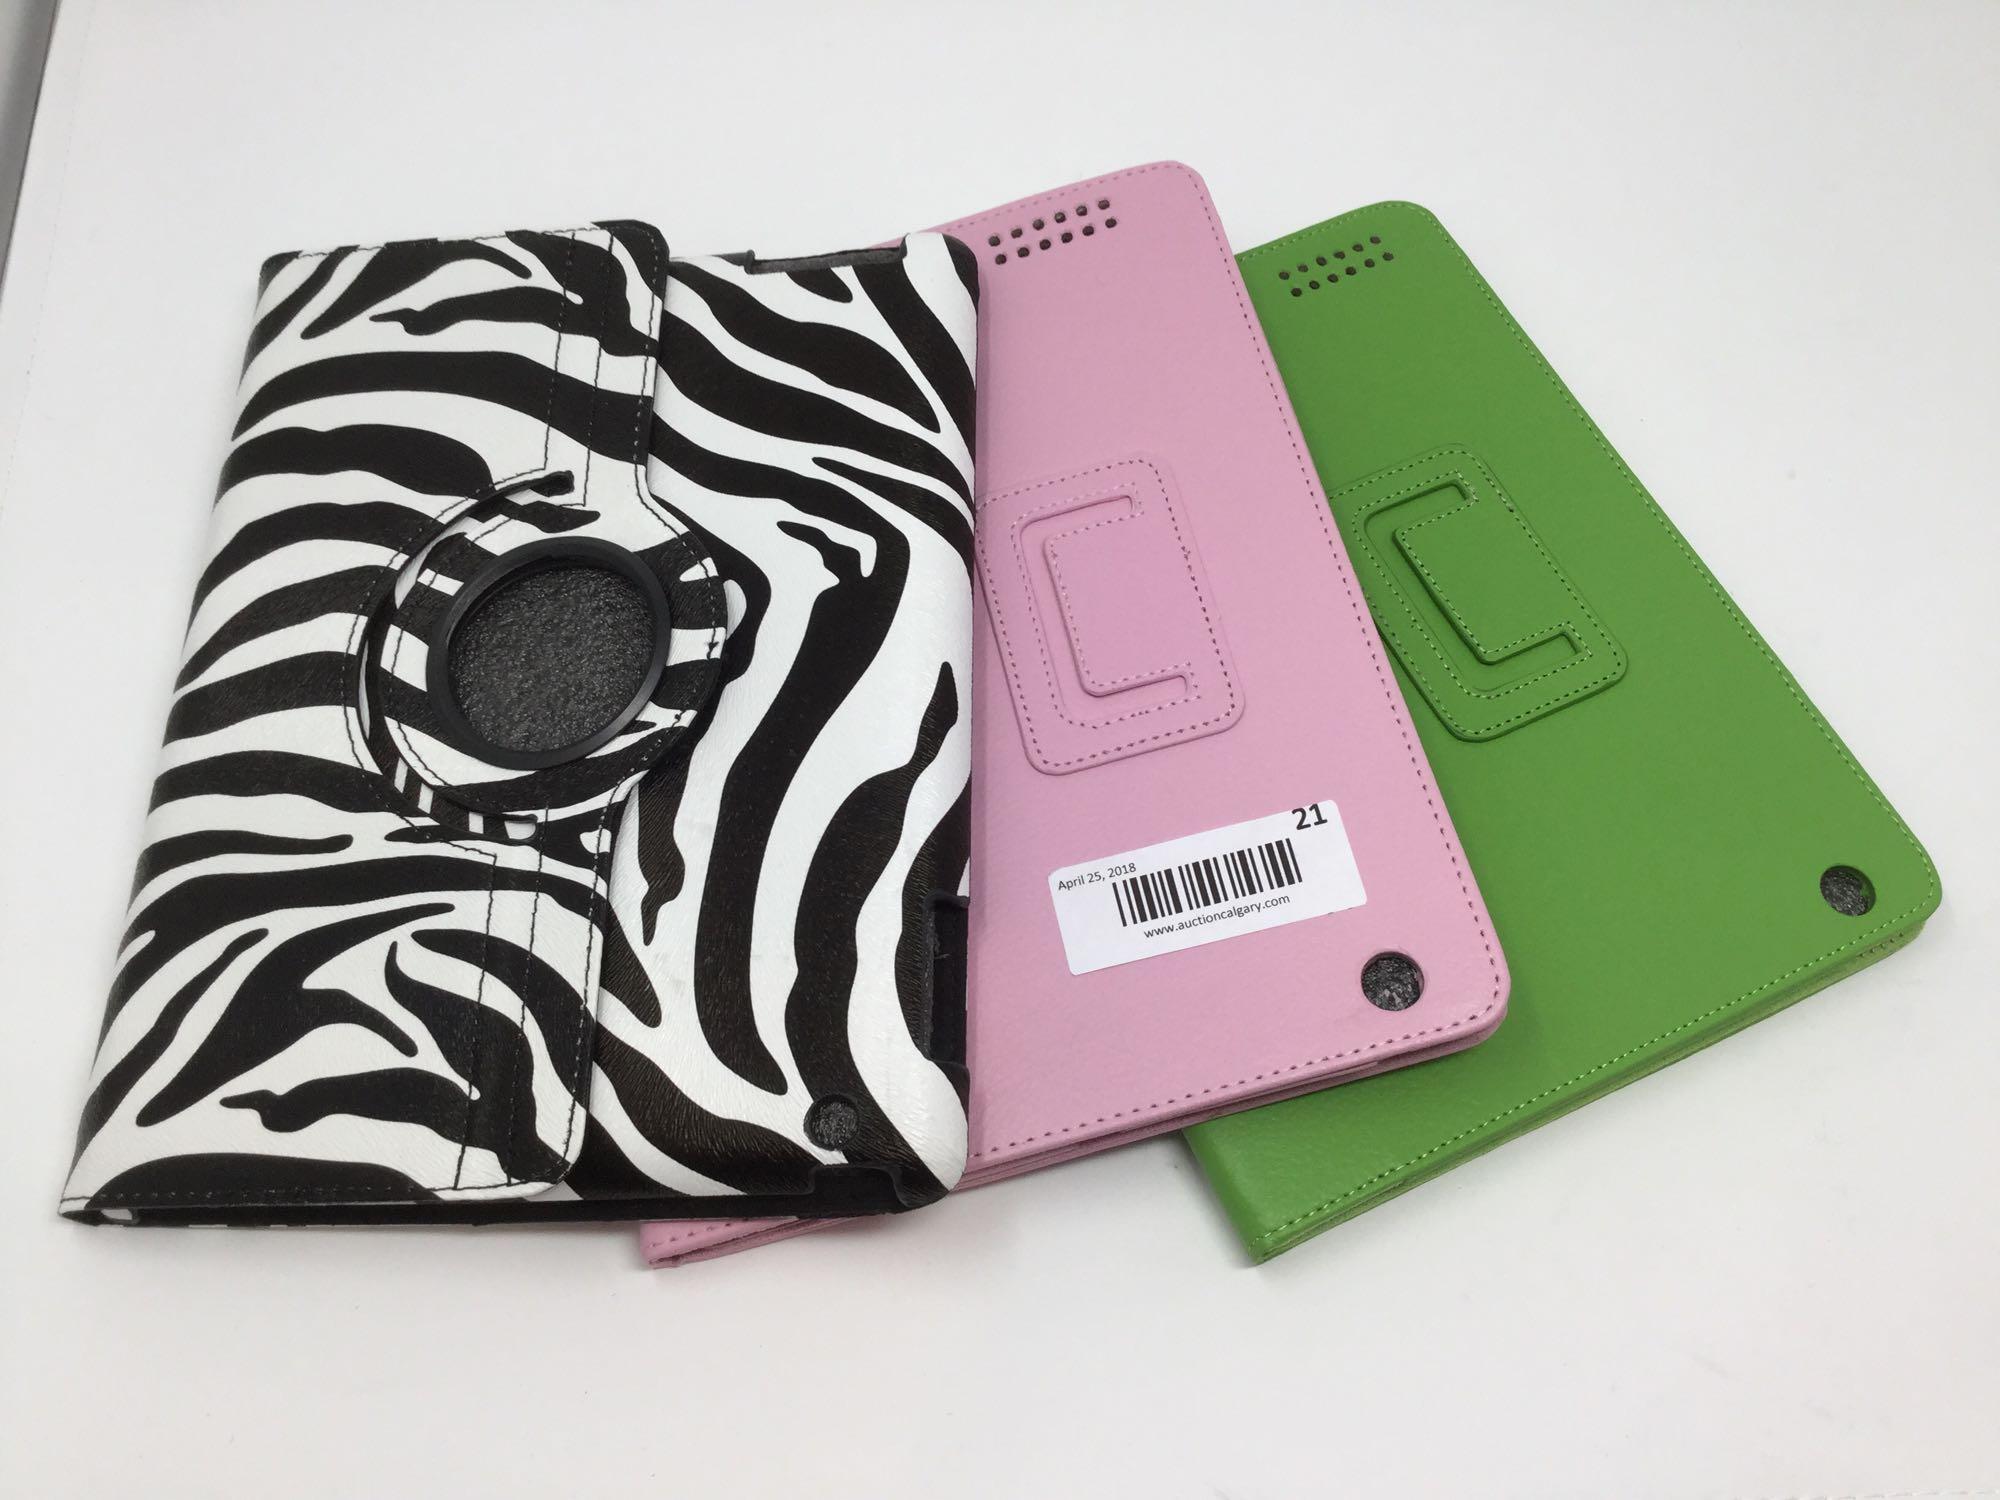 Lot 21 - Lot of 3 - iPad Covers